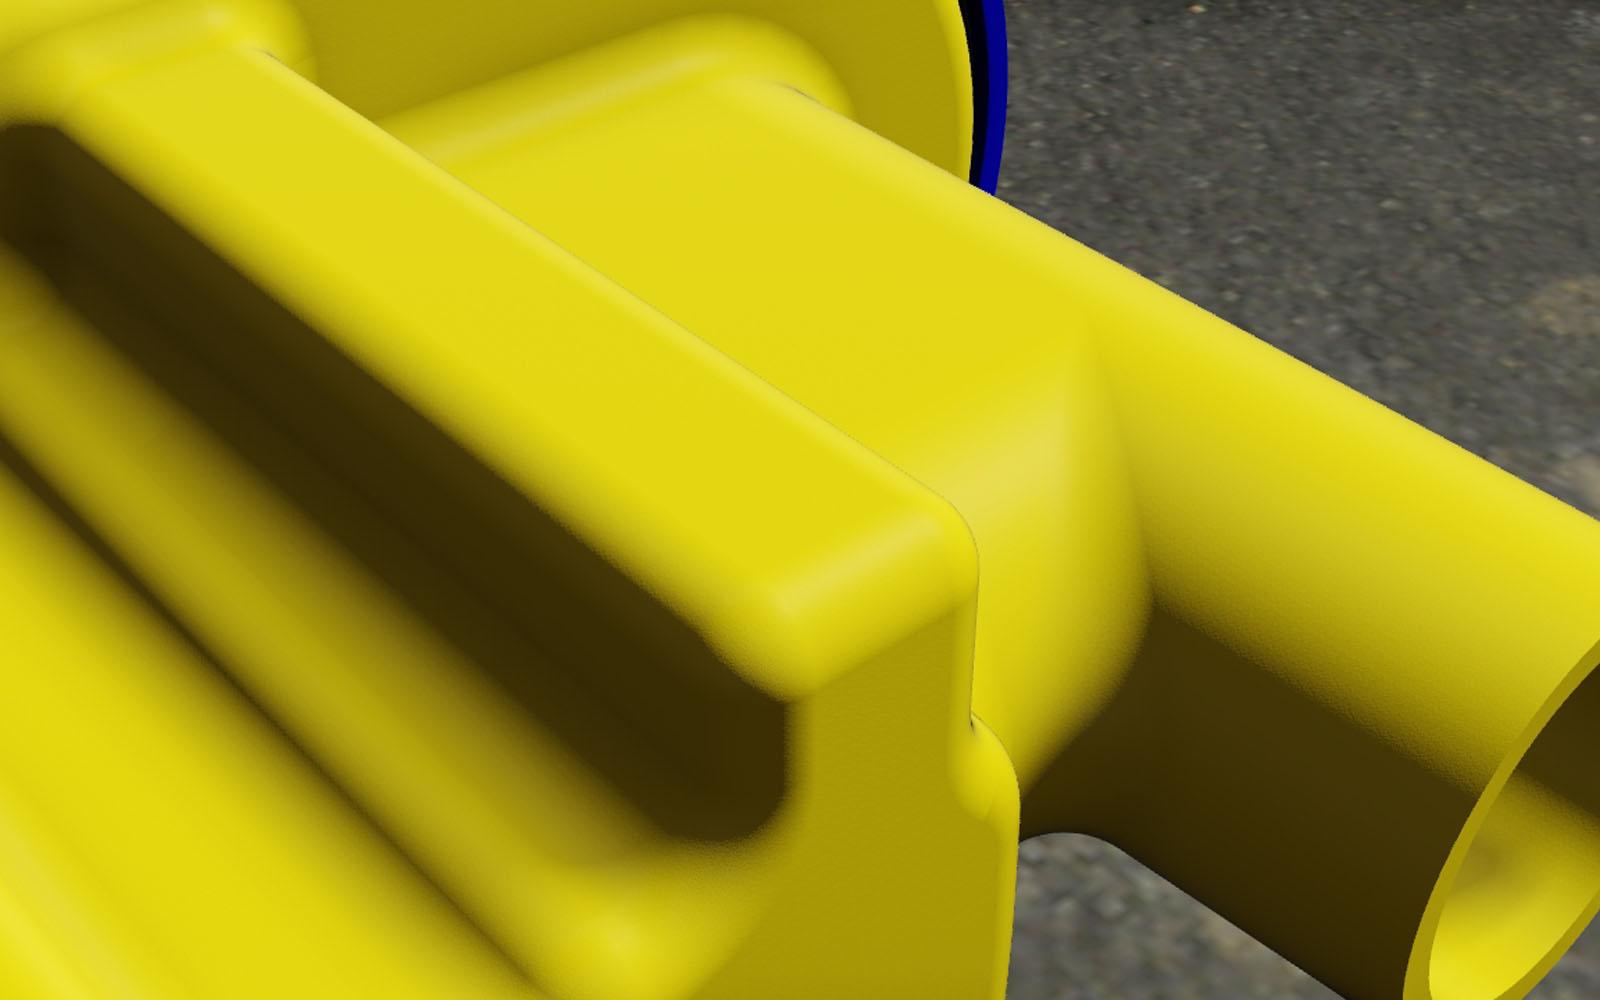 Conap CAD Konstruktionsbüro - CAD Modell eines Filtergehäuses